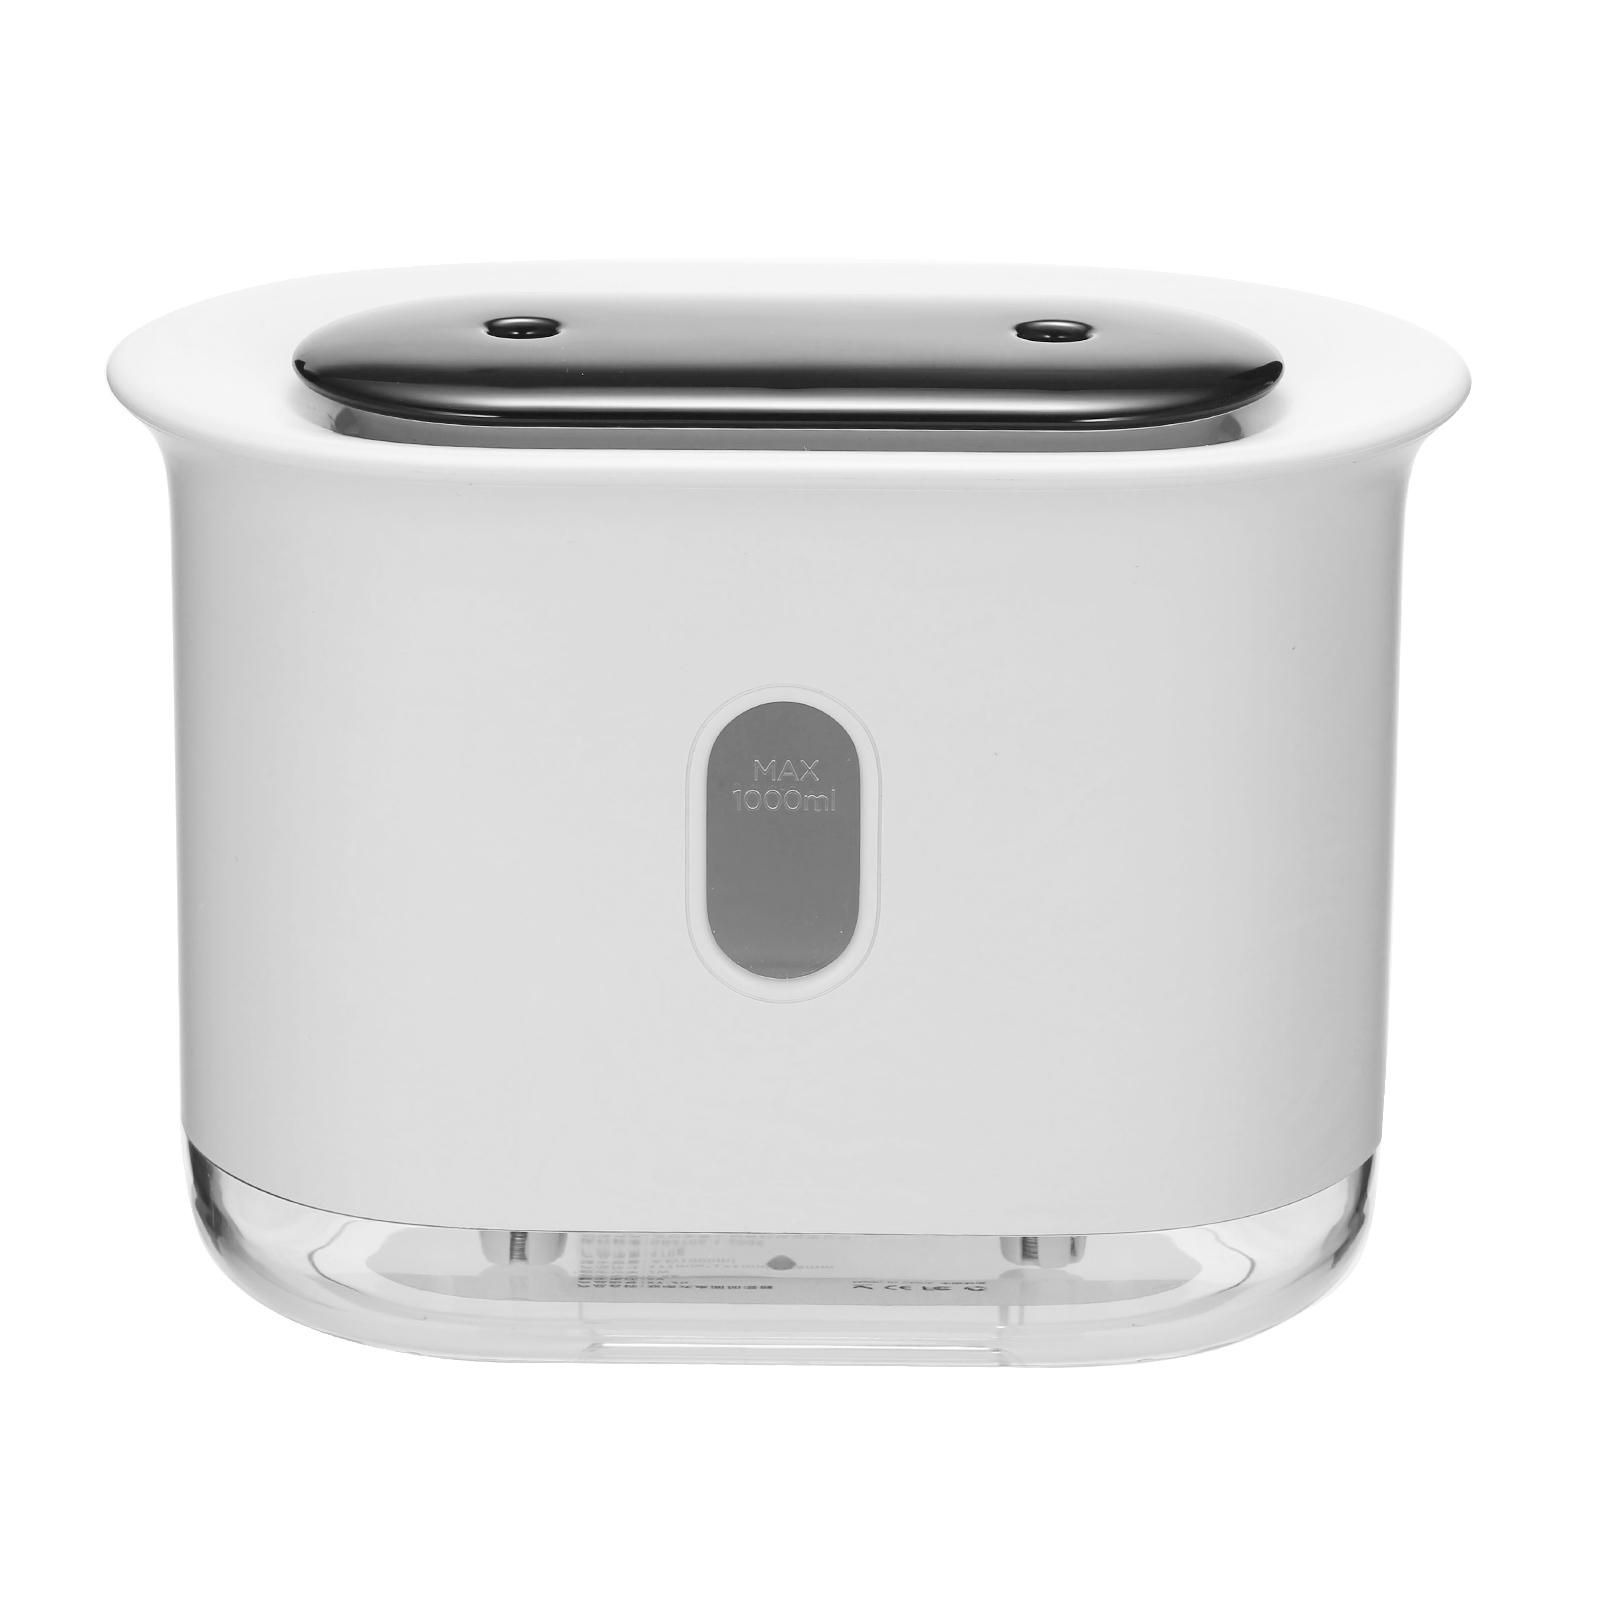 Cacagoo 1000ml Desktop Humidifier Double Mist Spray Vent Cool Mist Maker Air Diffuser Led Night Lights Battery Digital Display For Home Office Use Walmart Com Walmart Com